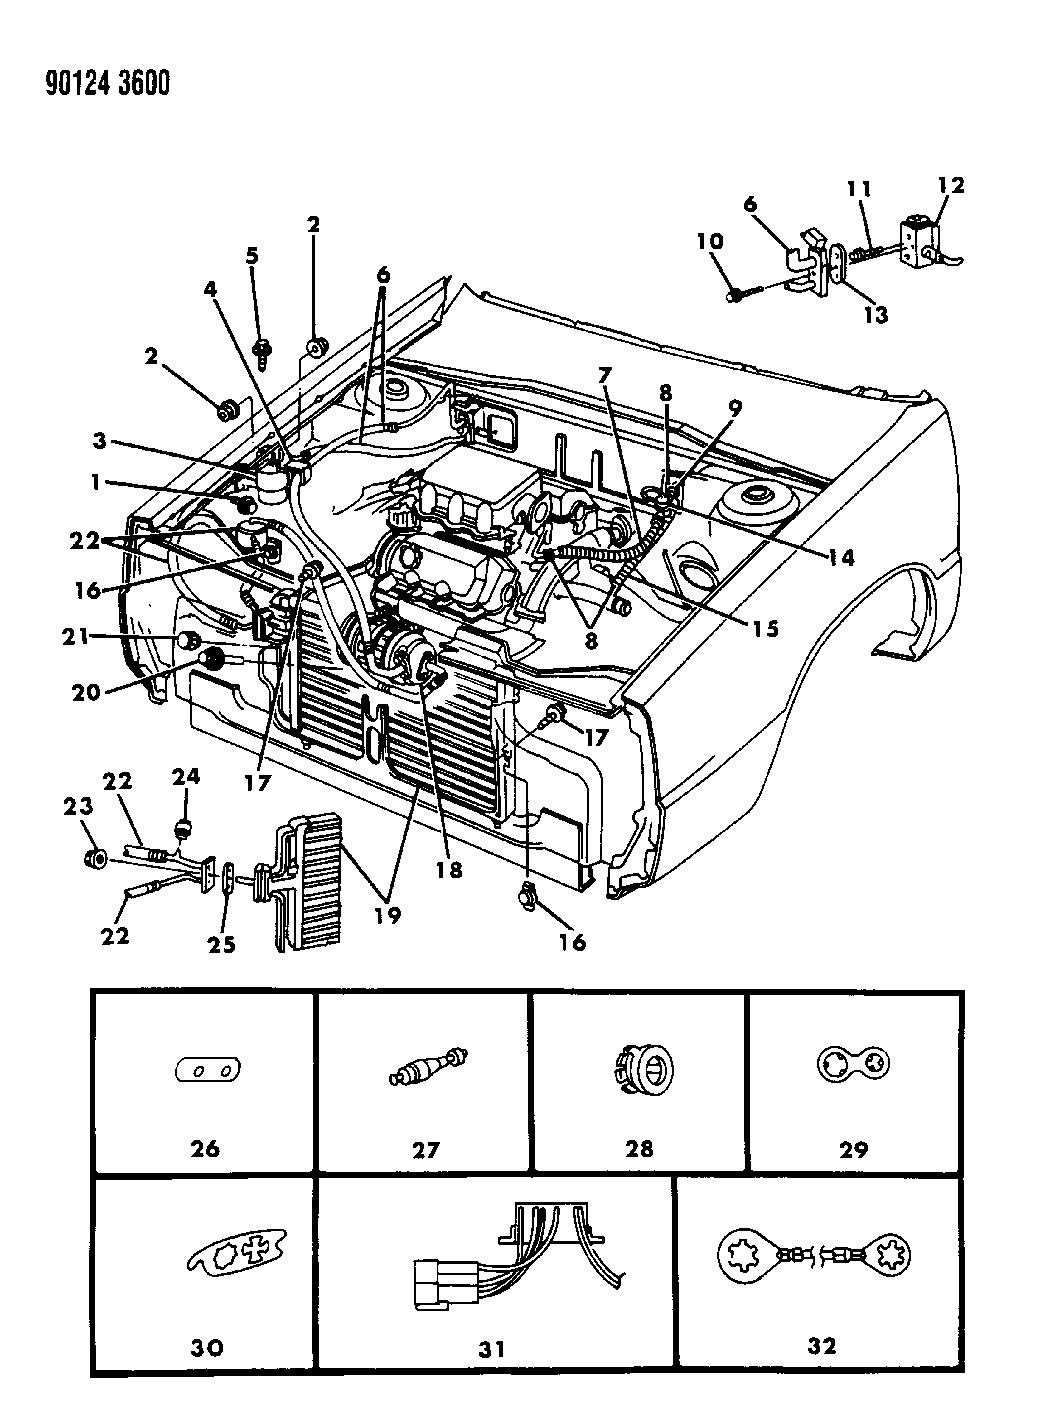 1990 dodge dynasty wiring diagram 1990 dodge dynasty plumbing a c   heater mopar parts giant  1990 dodge dynasty plumbing a c